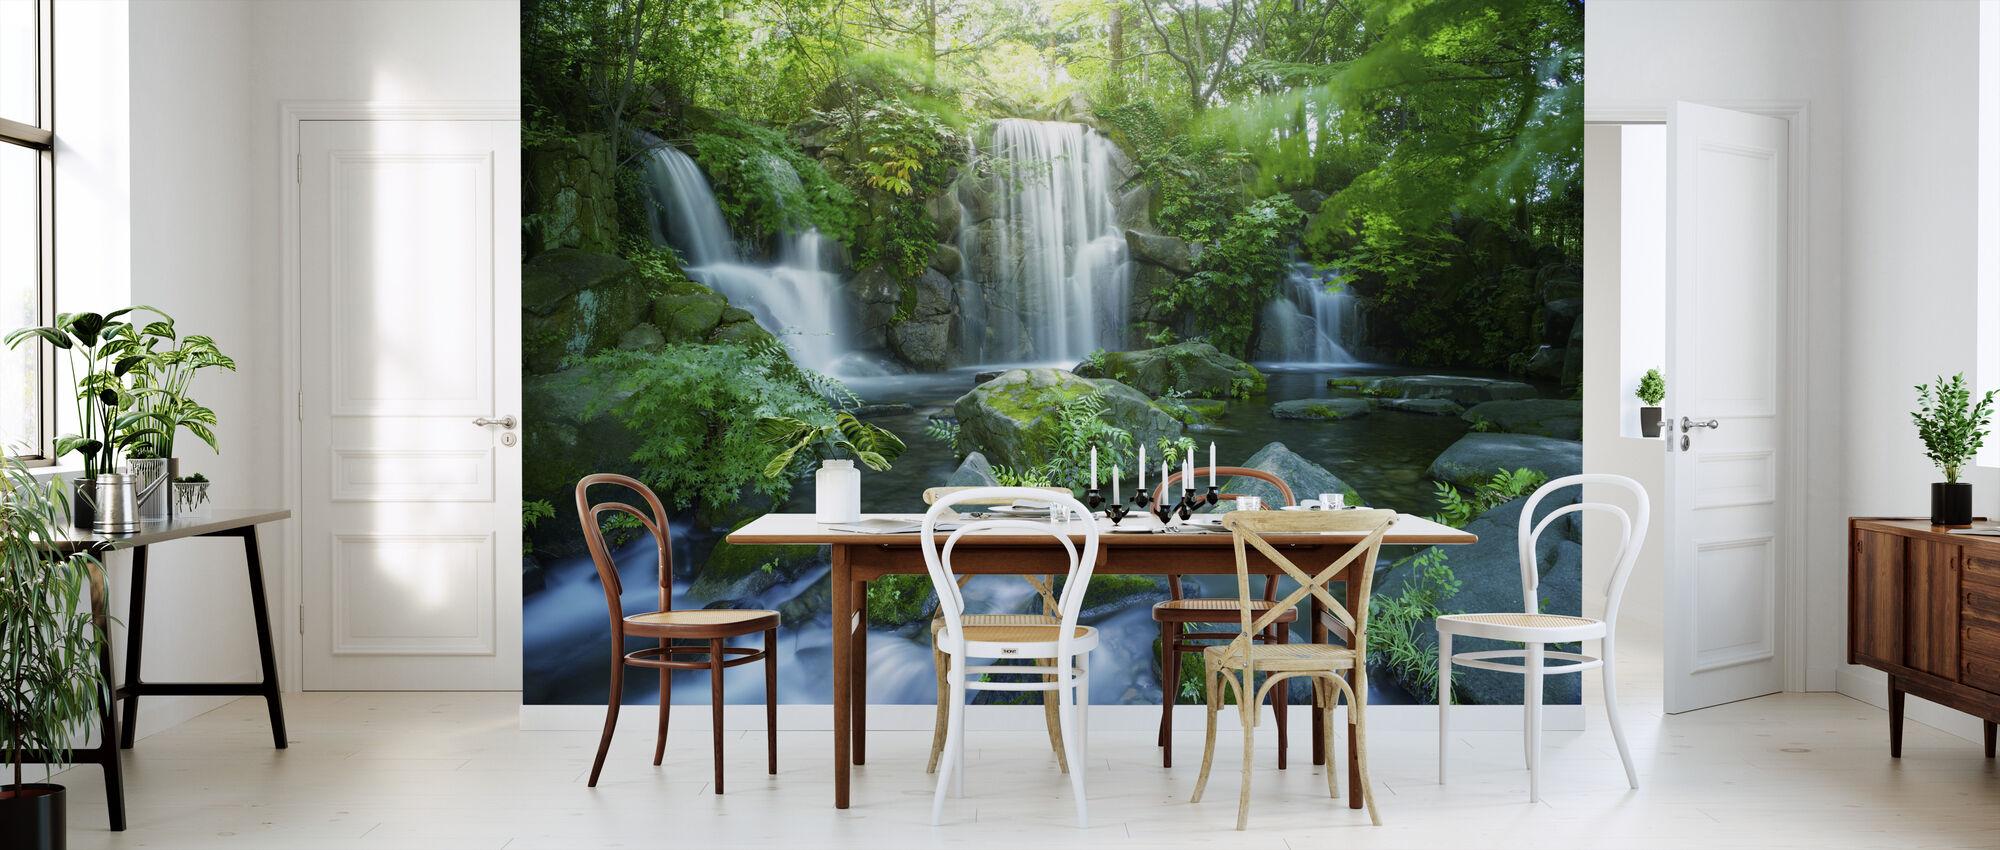 Waterfall in Tokyo - Wallpaper - Kitchen